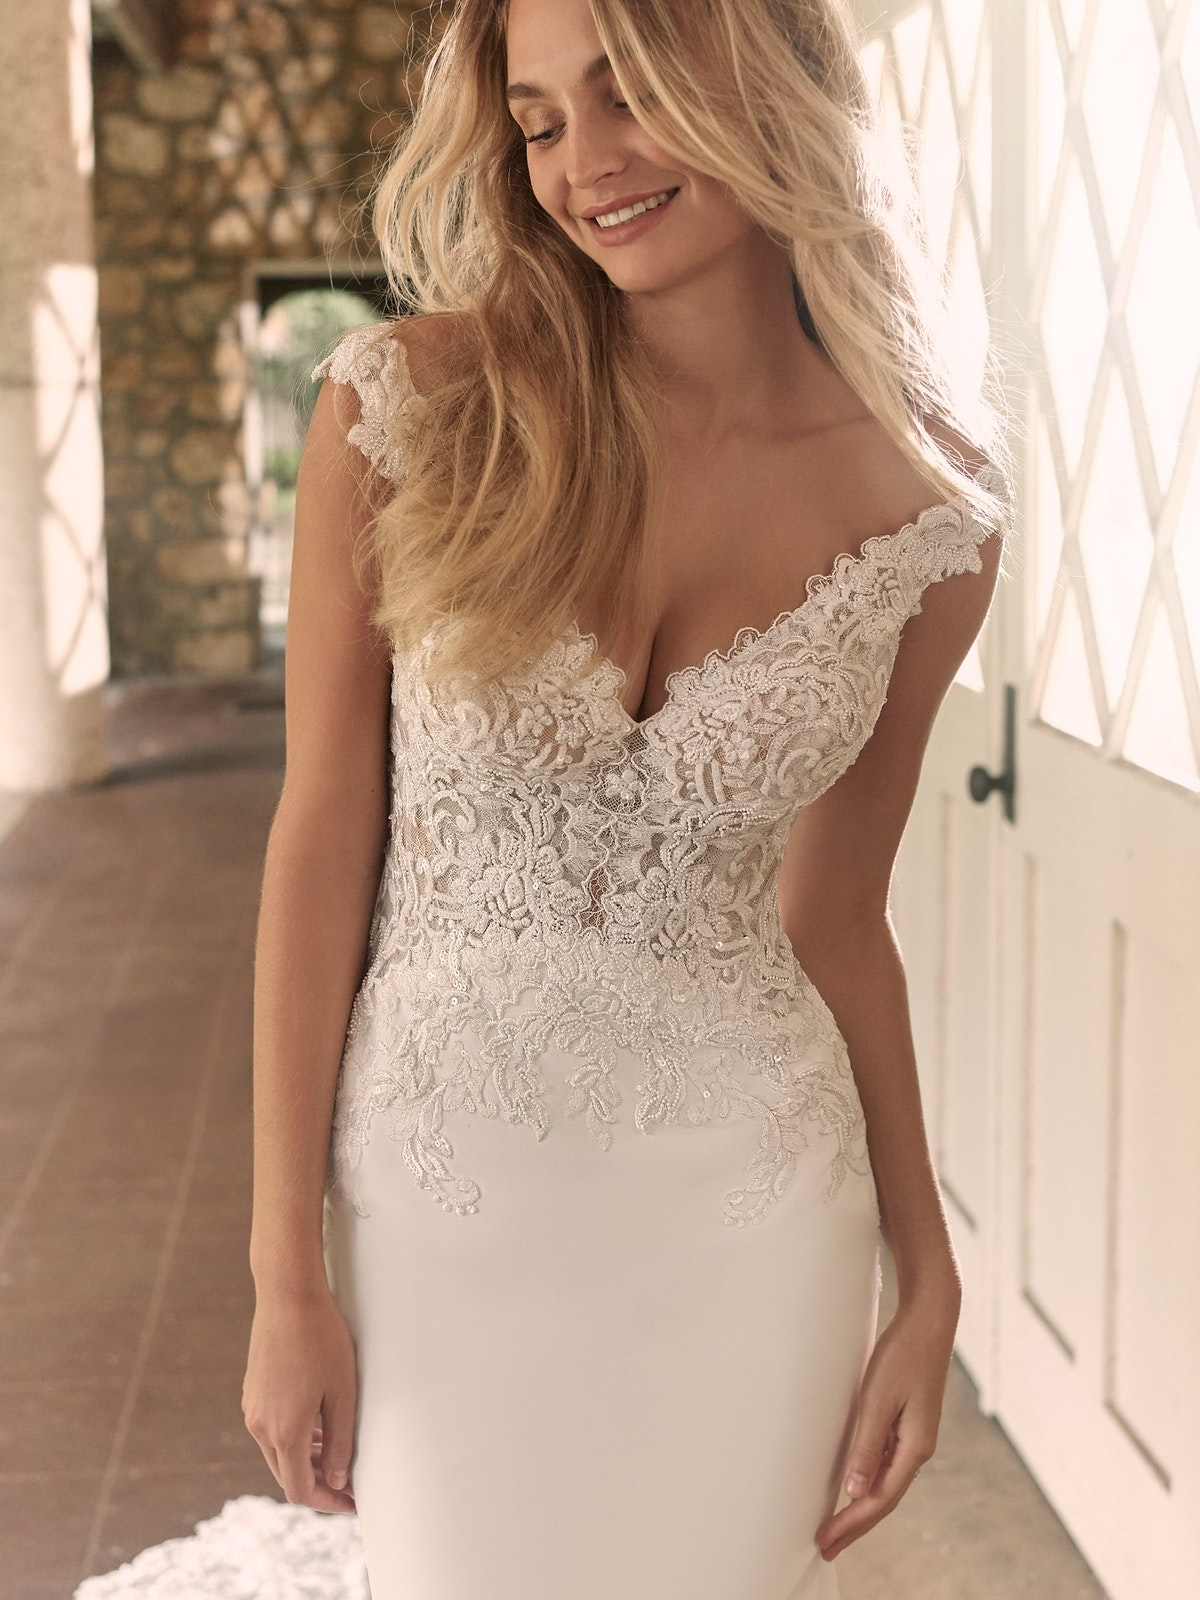 Maggie Sottero Antonella Sophisticated Crepe Sheath Bridal Dress 21MT416 Main